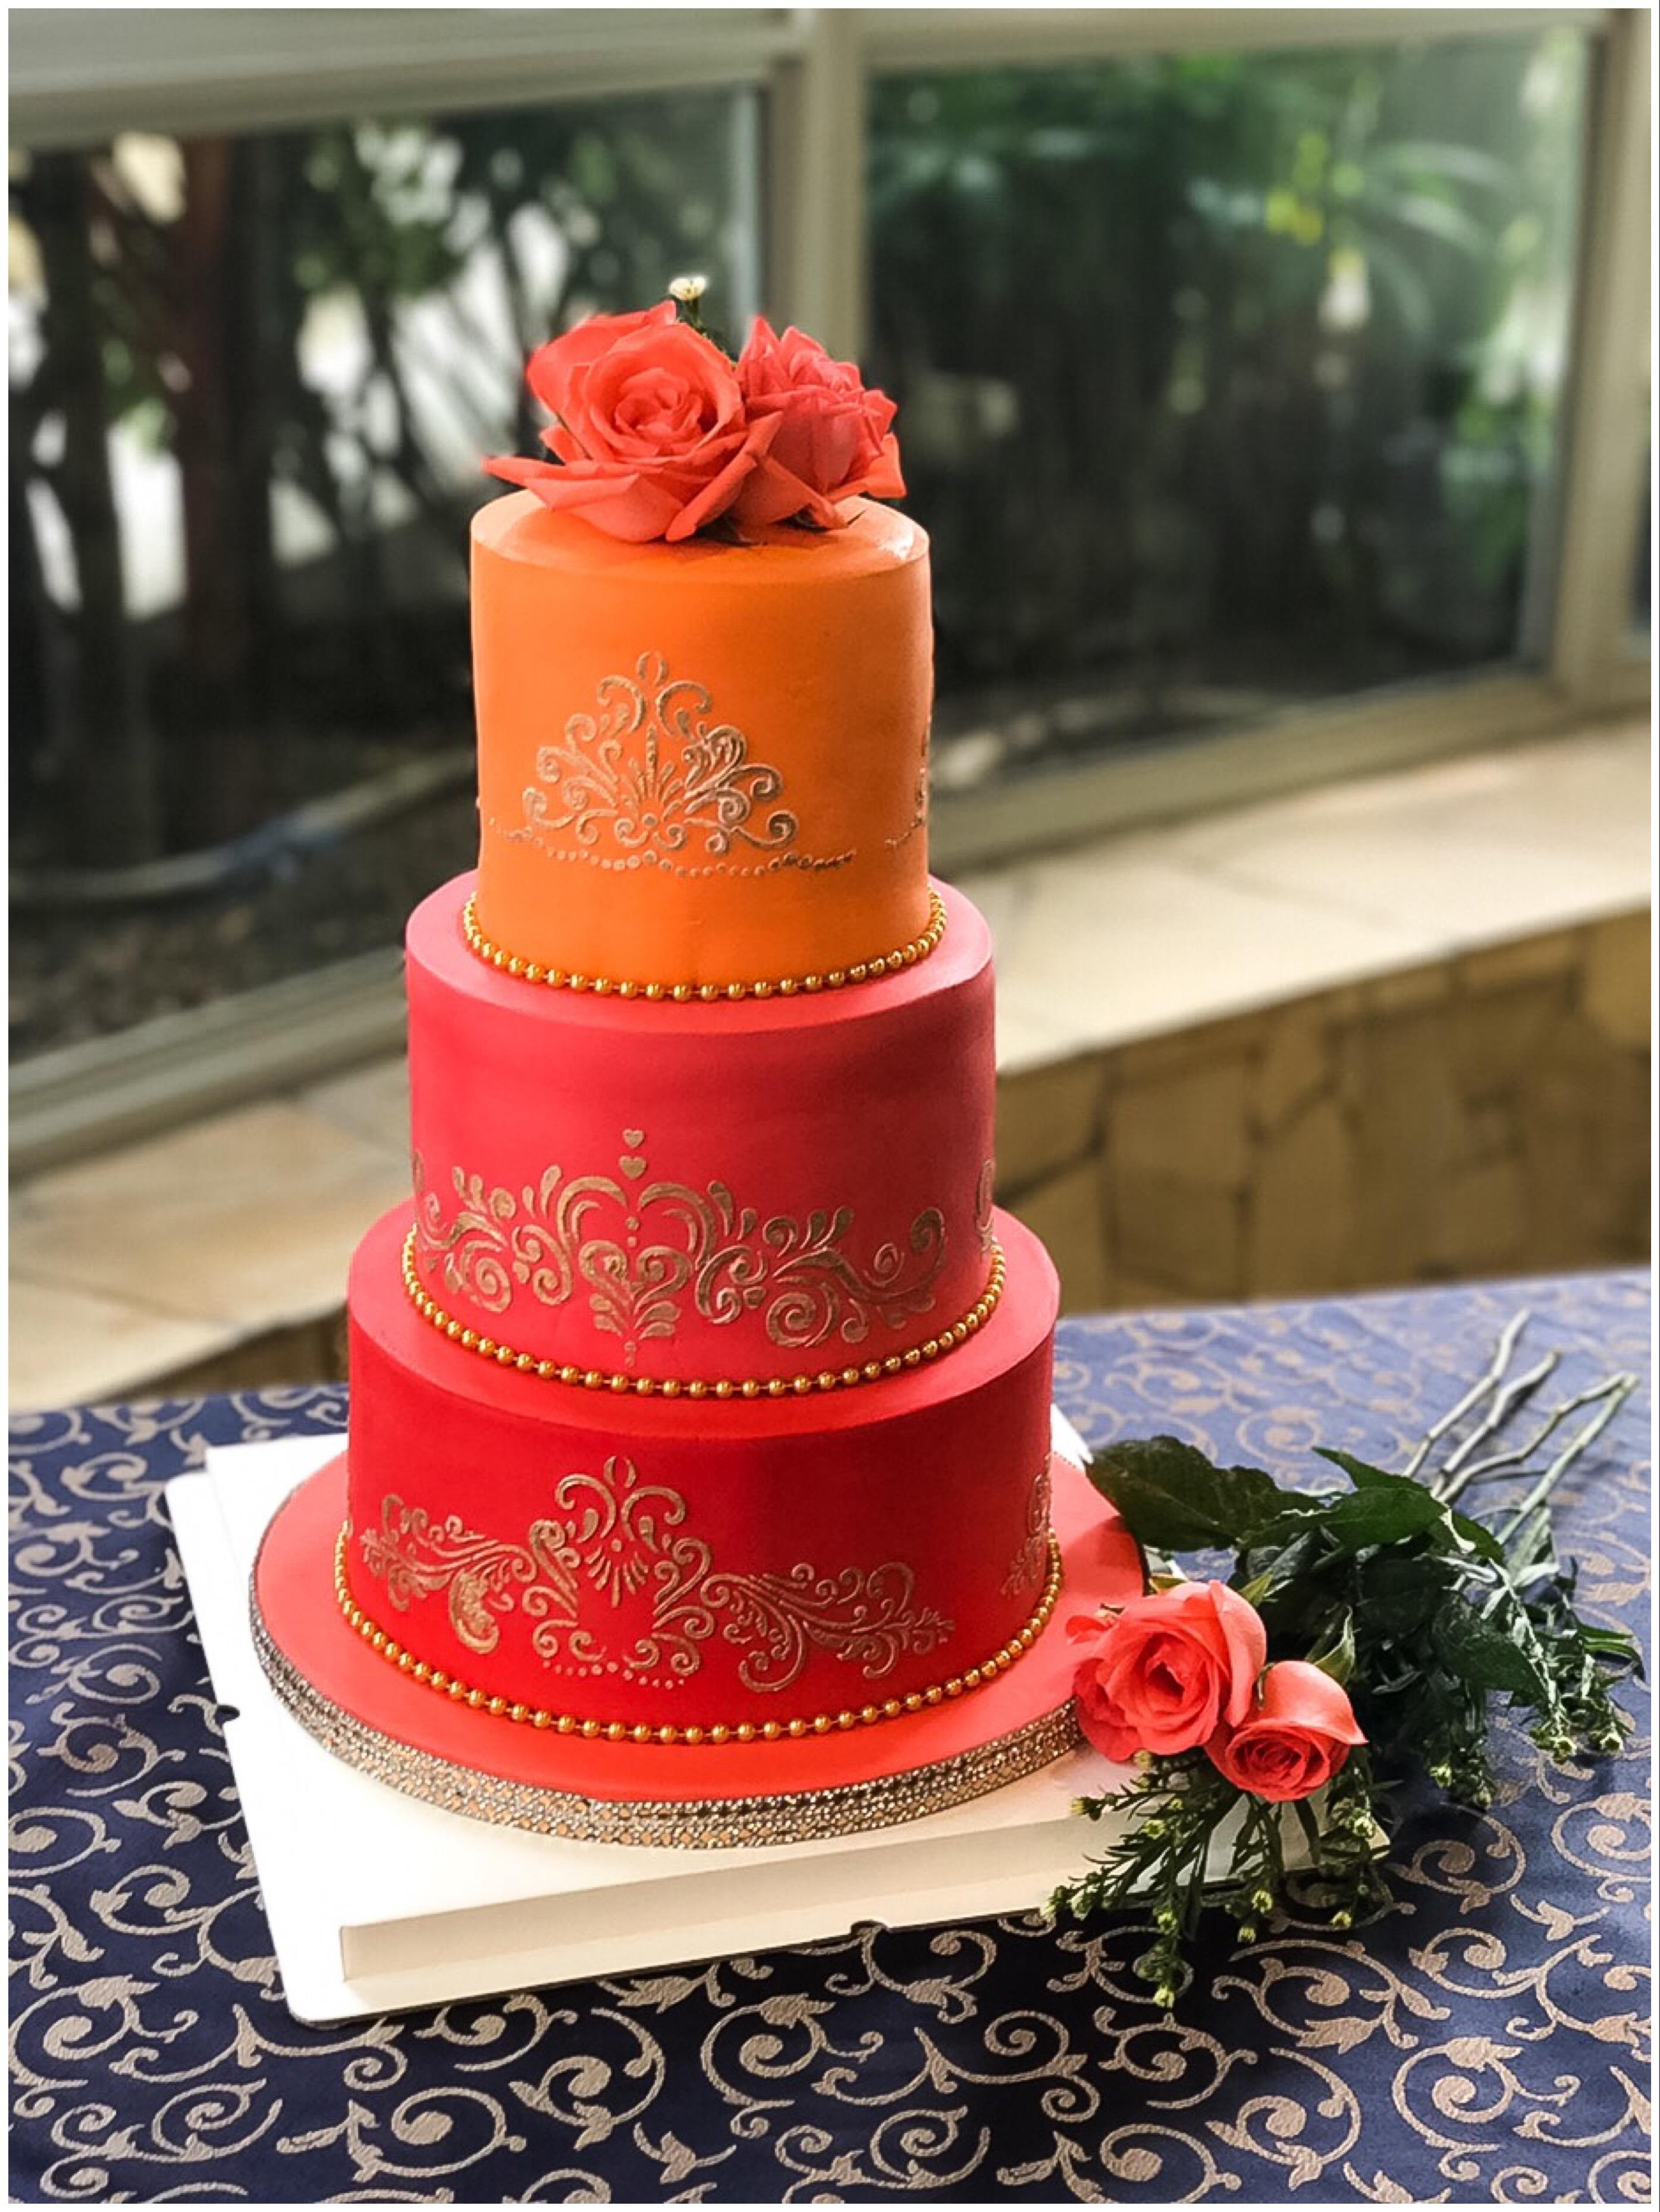 Orange and red wedding